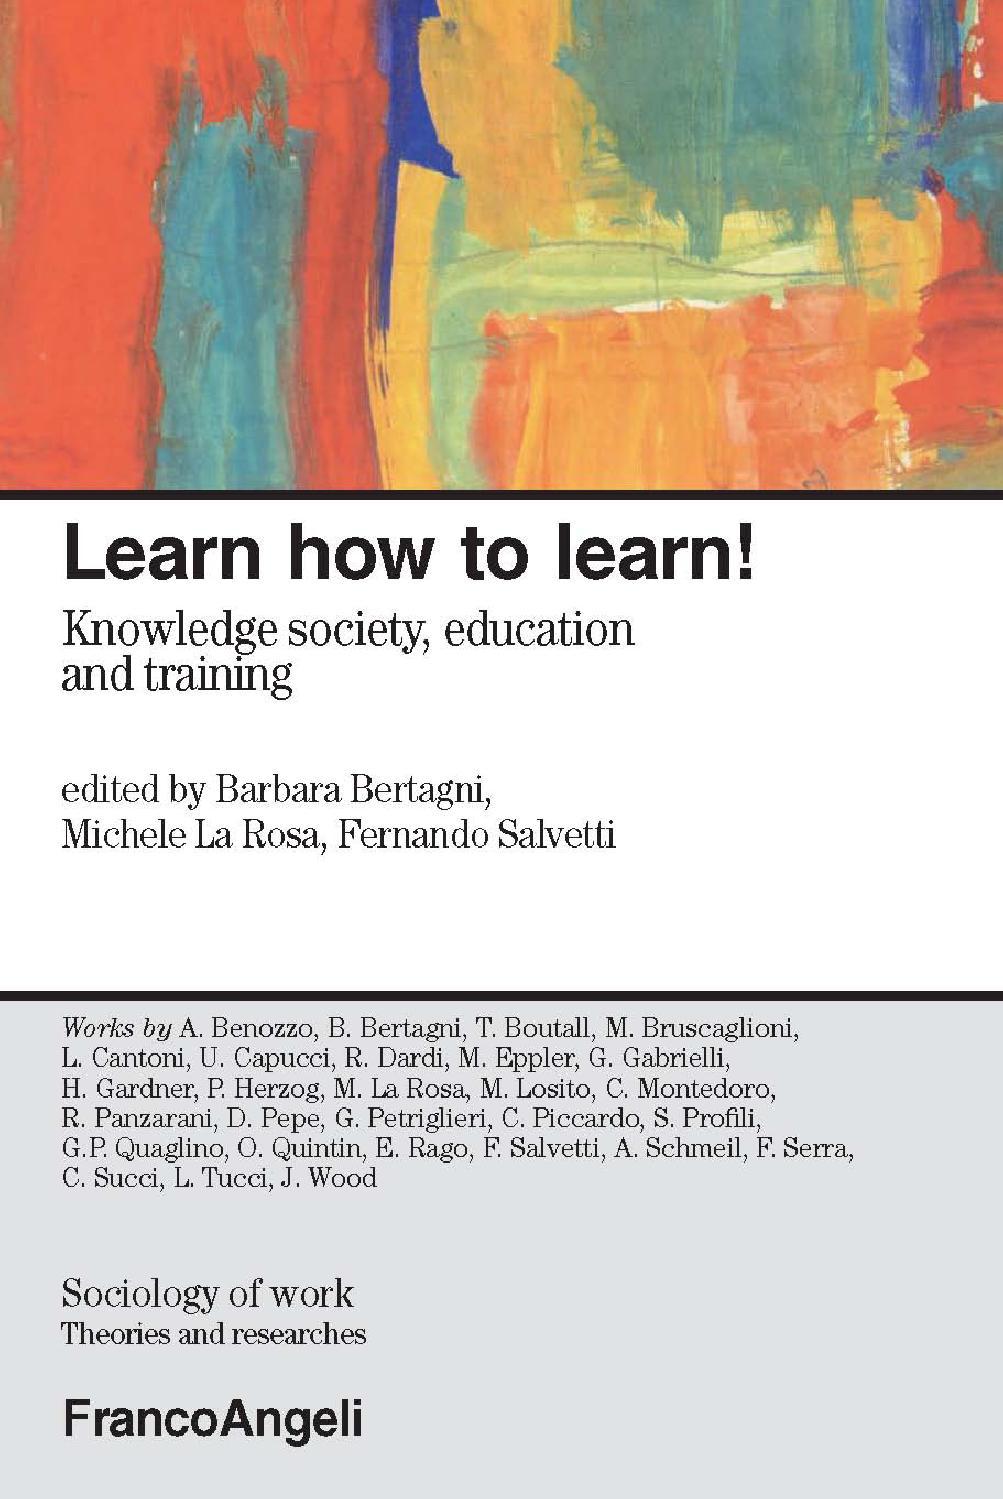 Studio Parisi E Associati Milano learn how to learn! knowledge society, education and